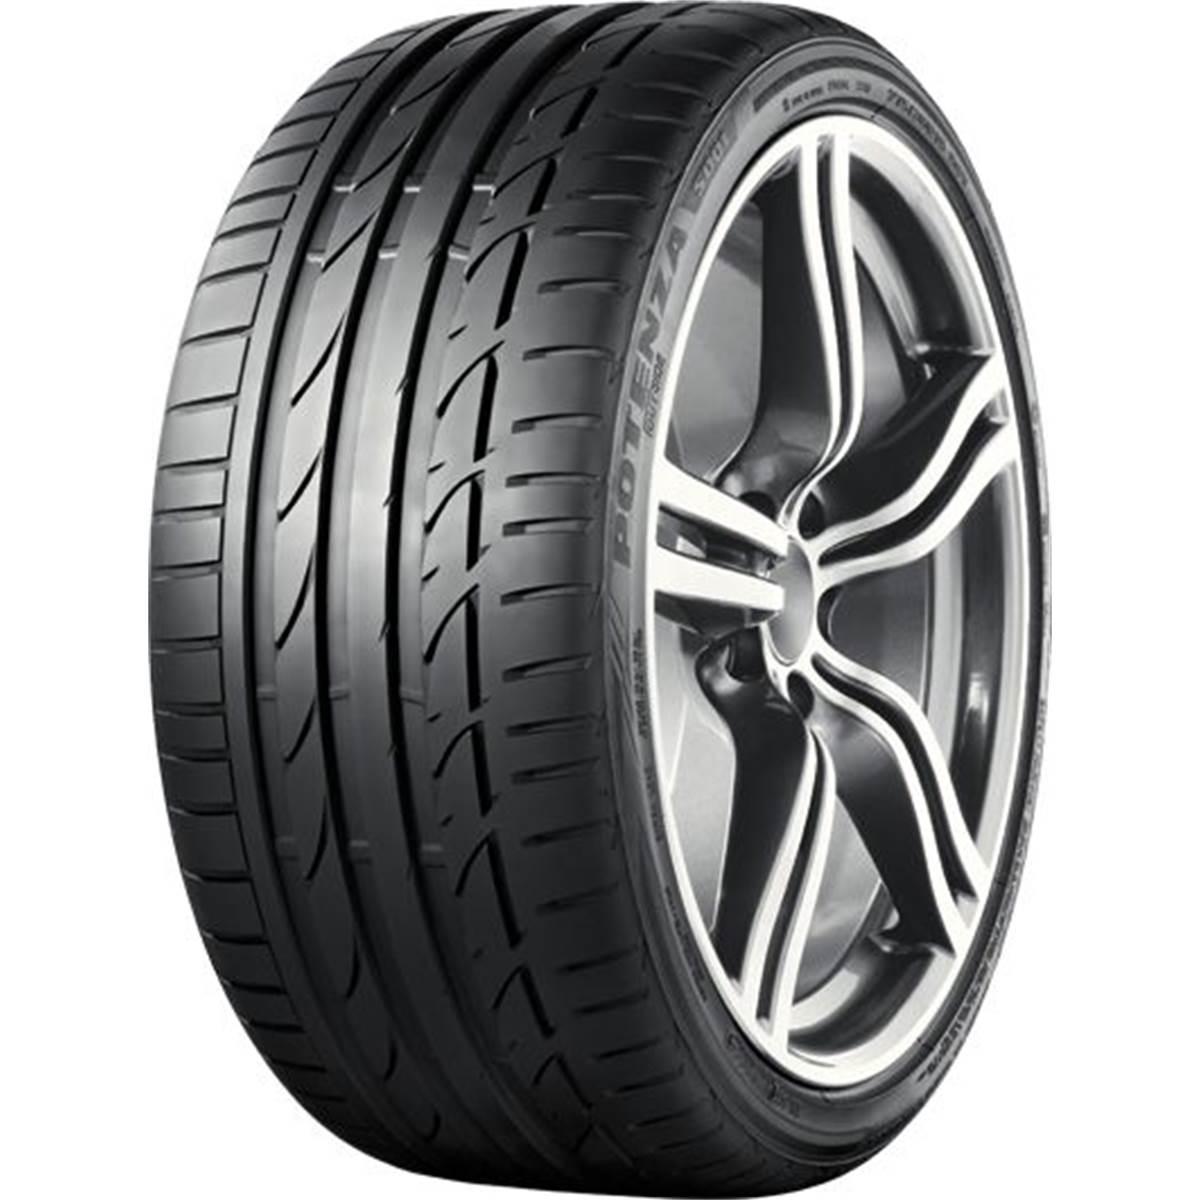 Pneu Runflat Bridgestone 295/35R20 101Y Potenza S001